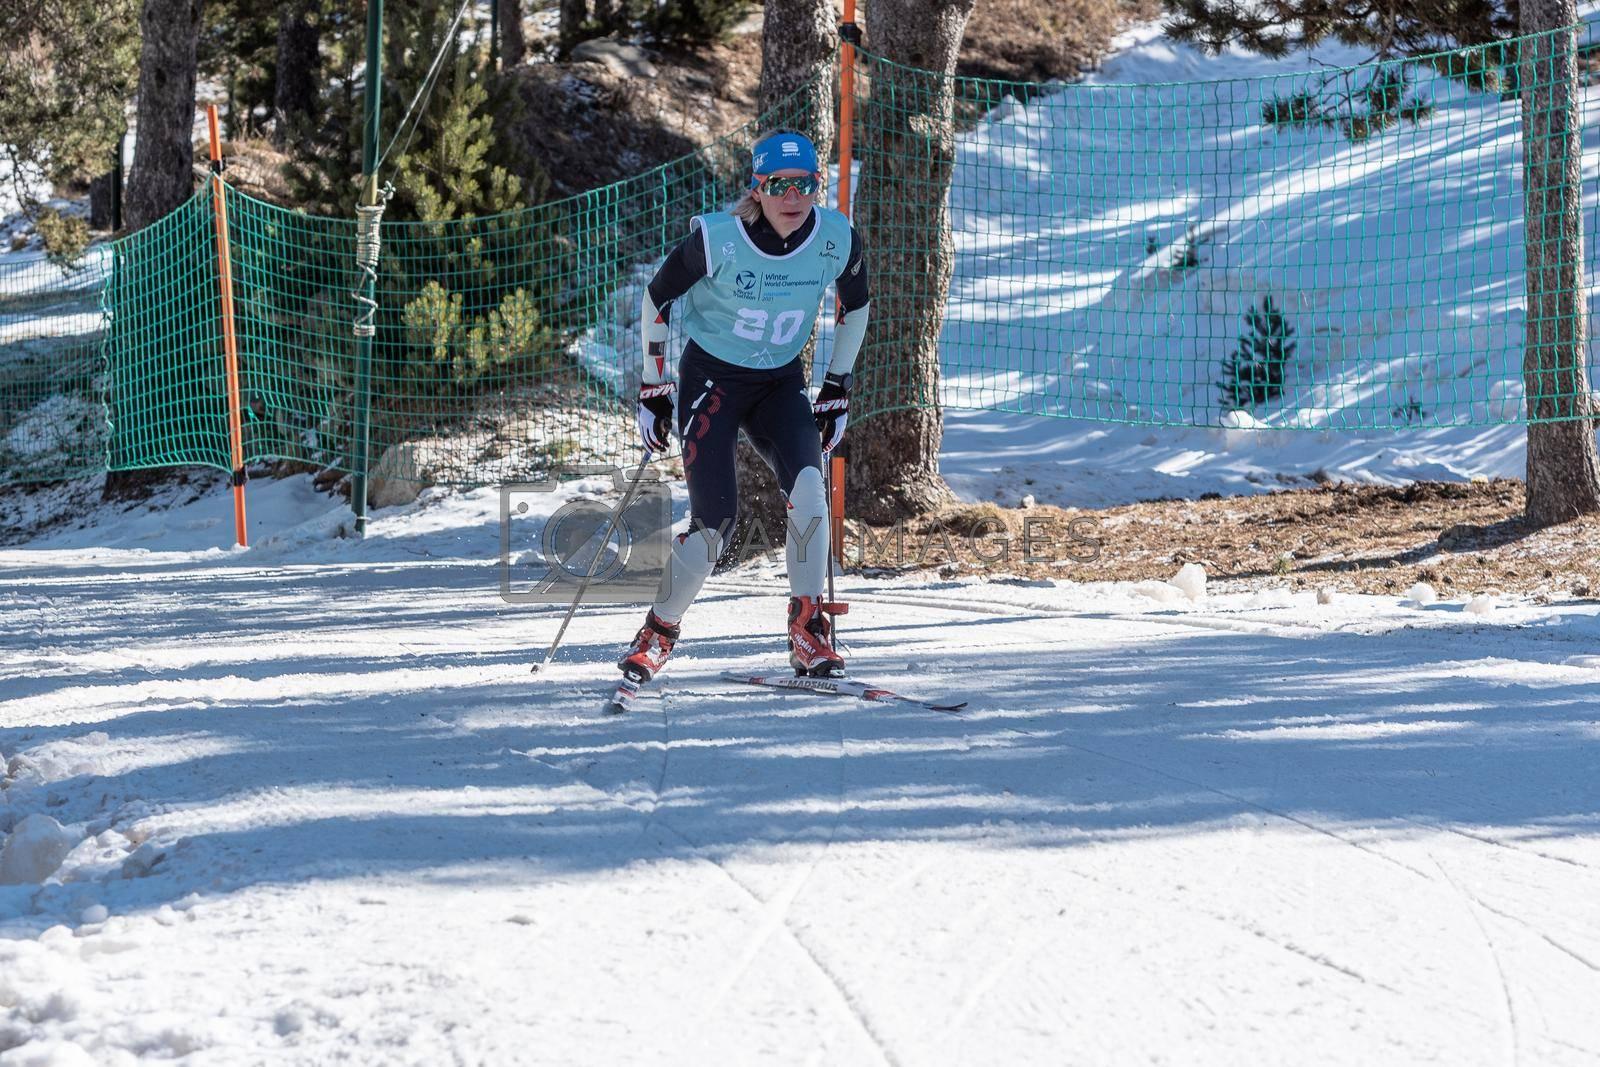 Naturlandia, Andorra : 2021 March 20 : Olga Cheremisinova RUS in the 2021 World Triathlon Winter Championships Andorra